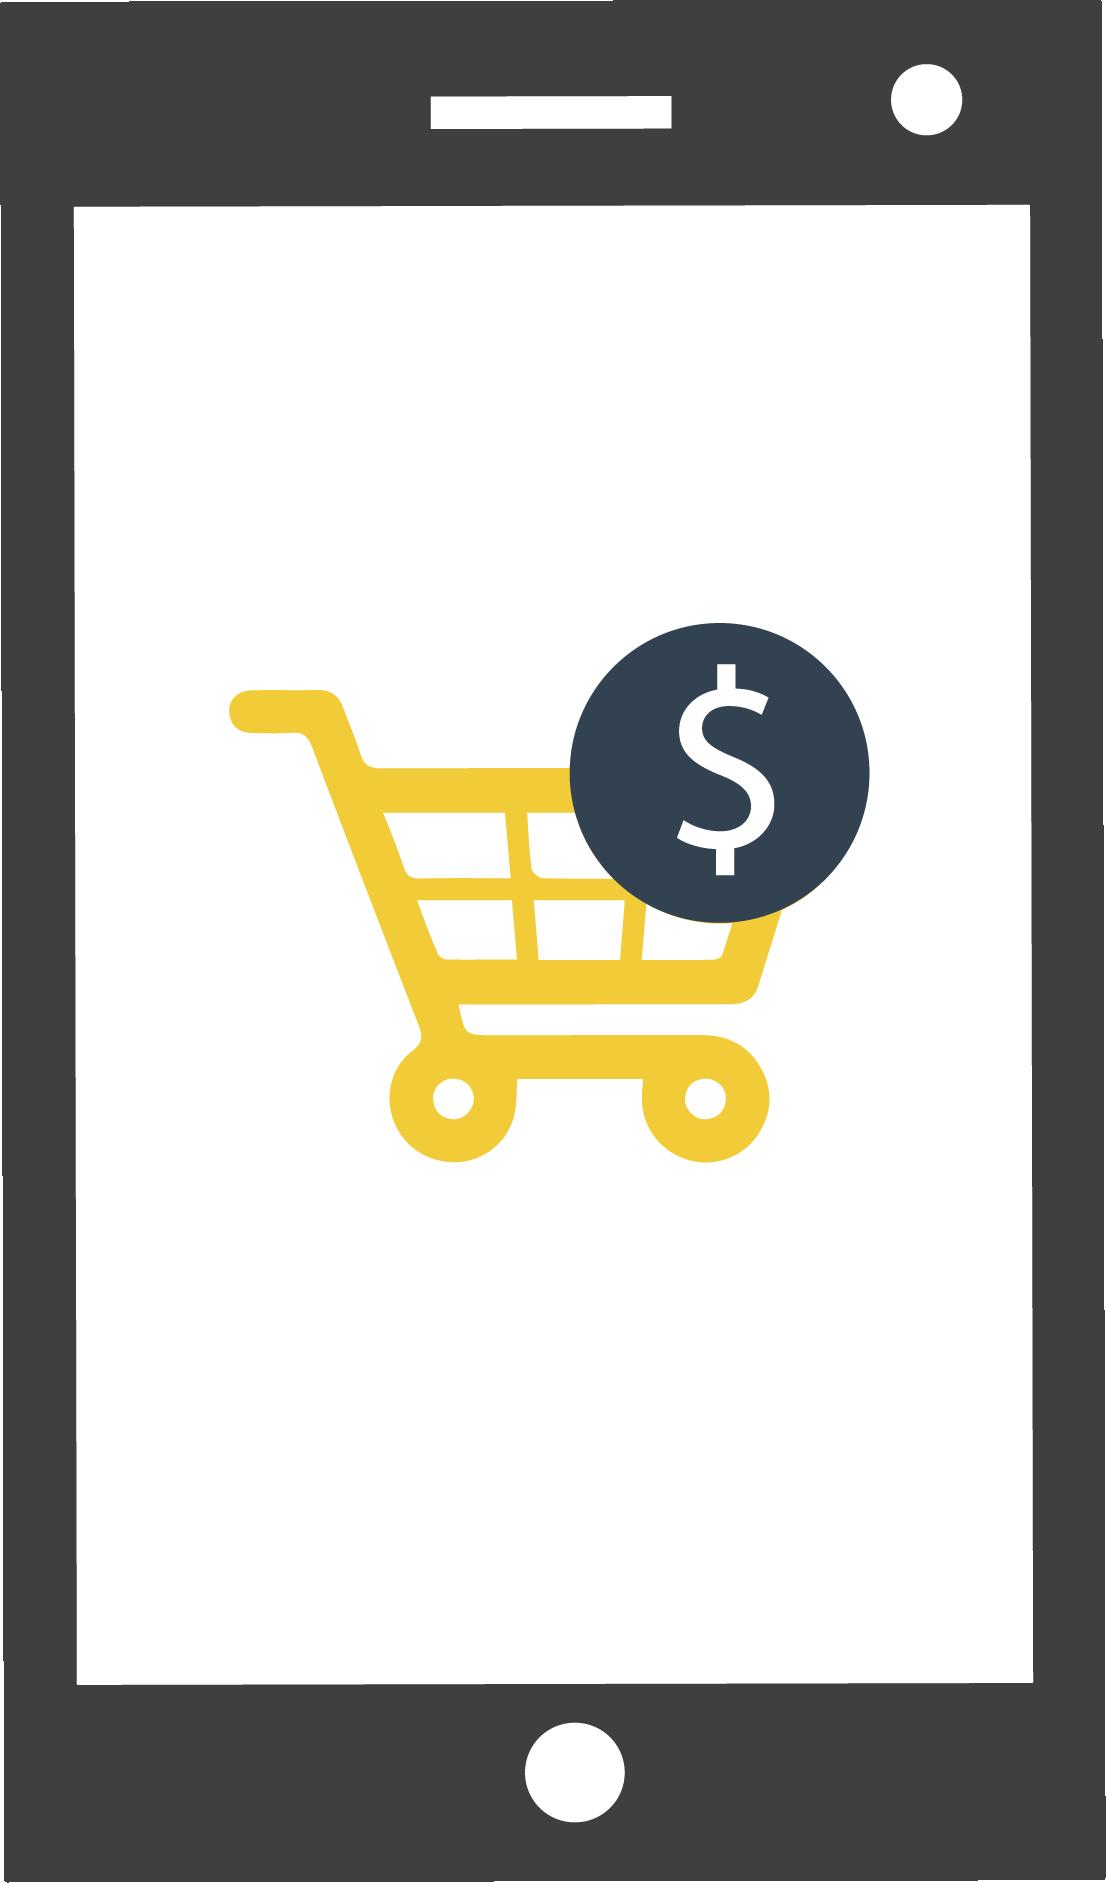 ReplyBuy Commerce